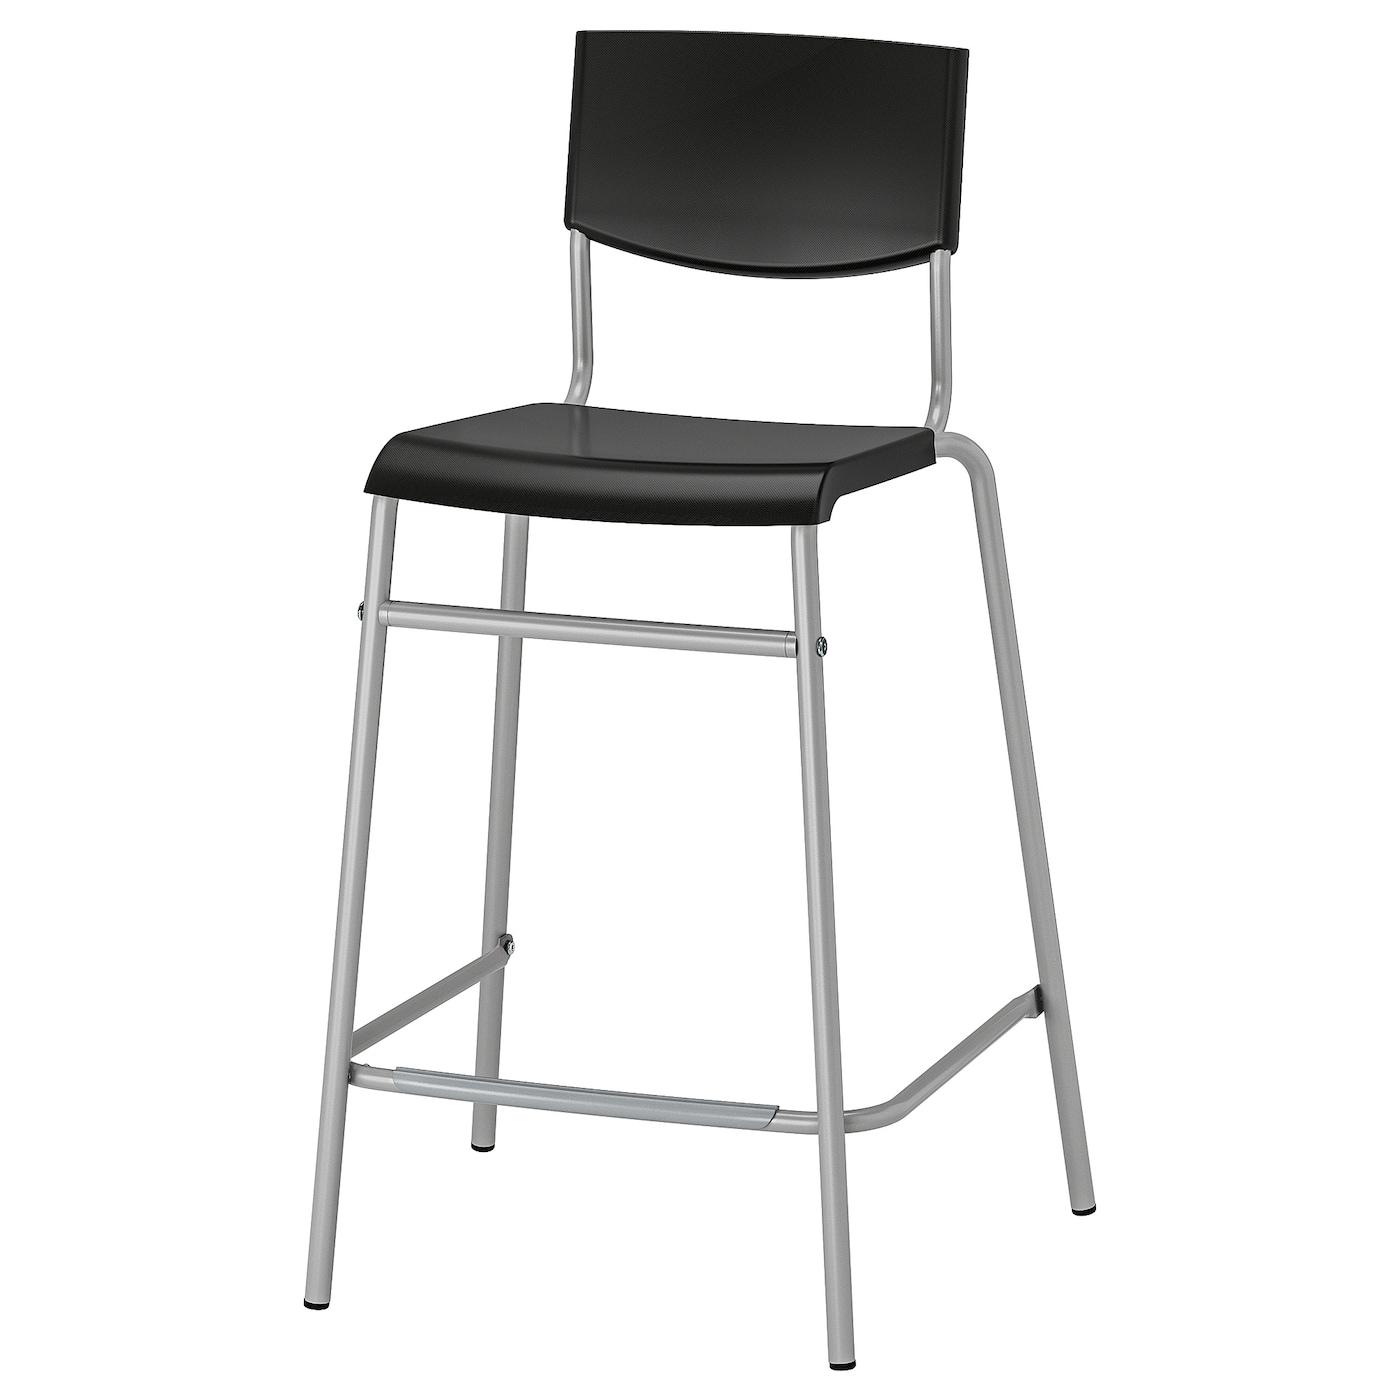 stig bar stool with backrest black silver color ikea